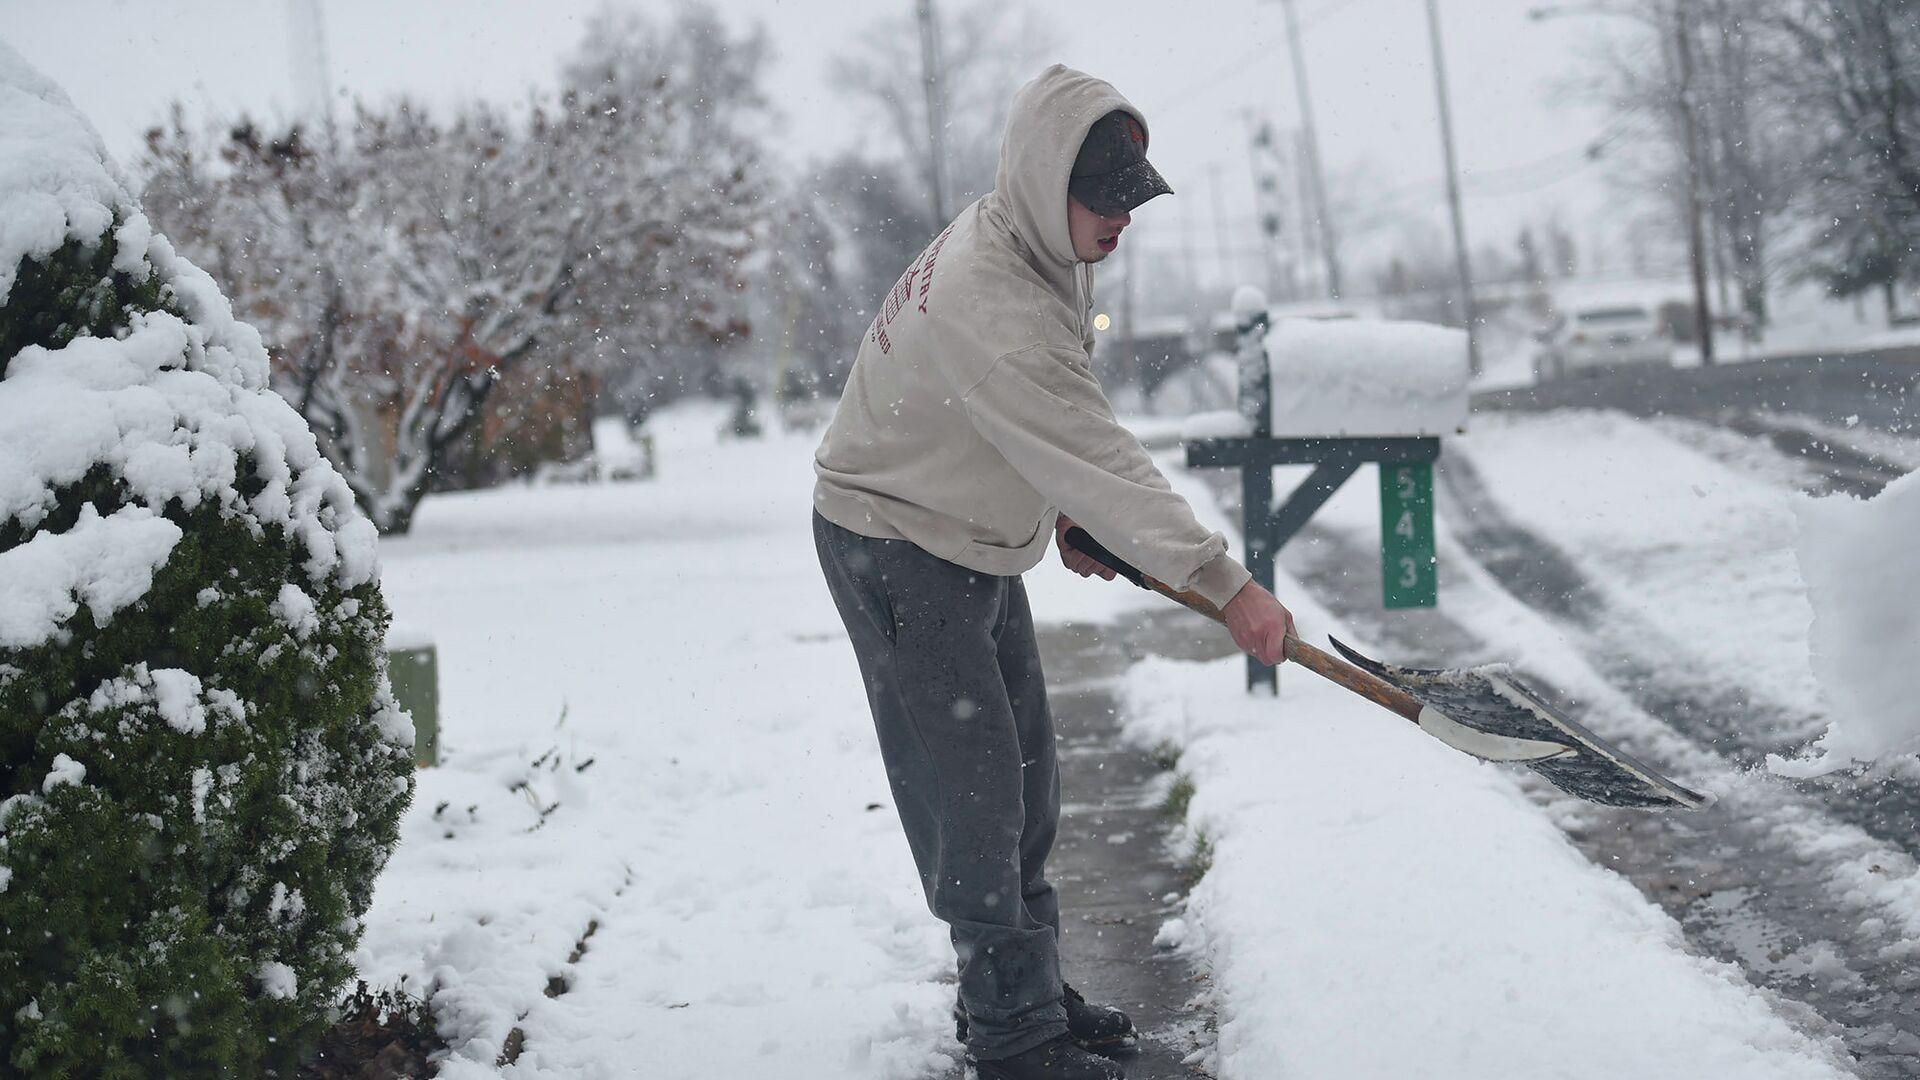 Мужчина очищает дорожку от снега в штате Пенсильвания, США. Архивное фото - РИА Новости, 1920, 04.03.2021